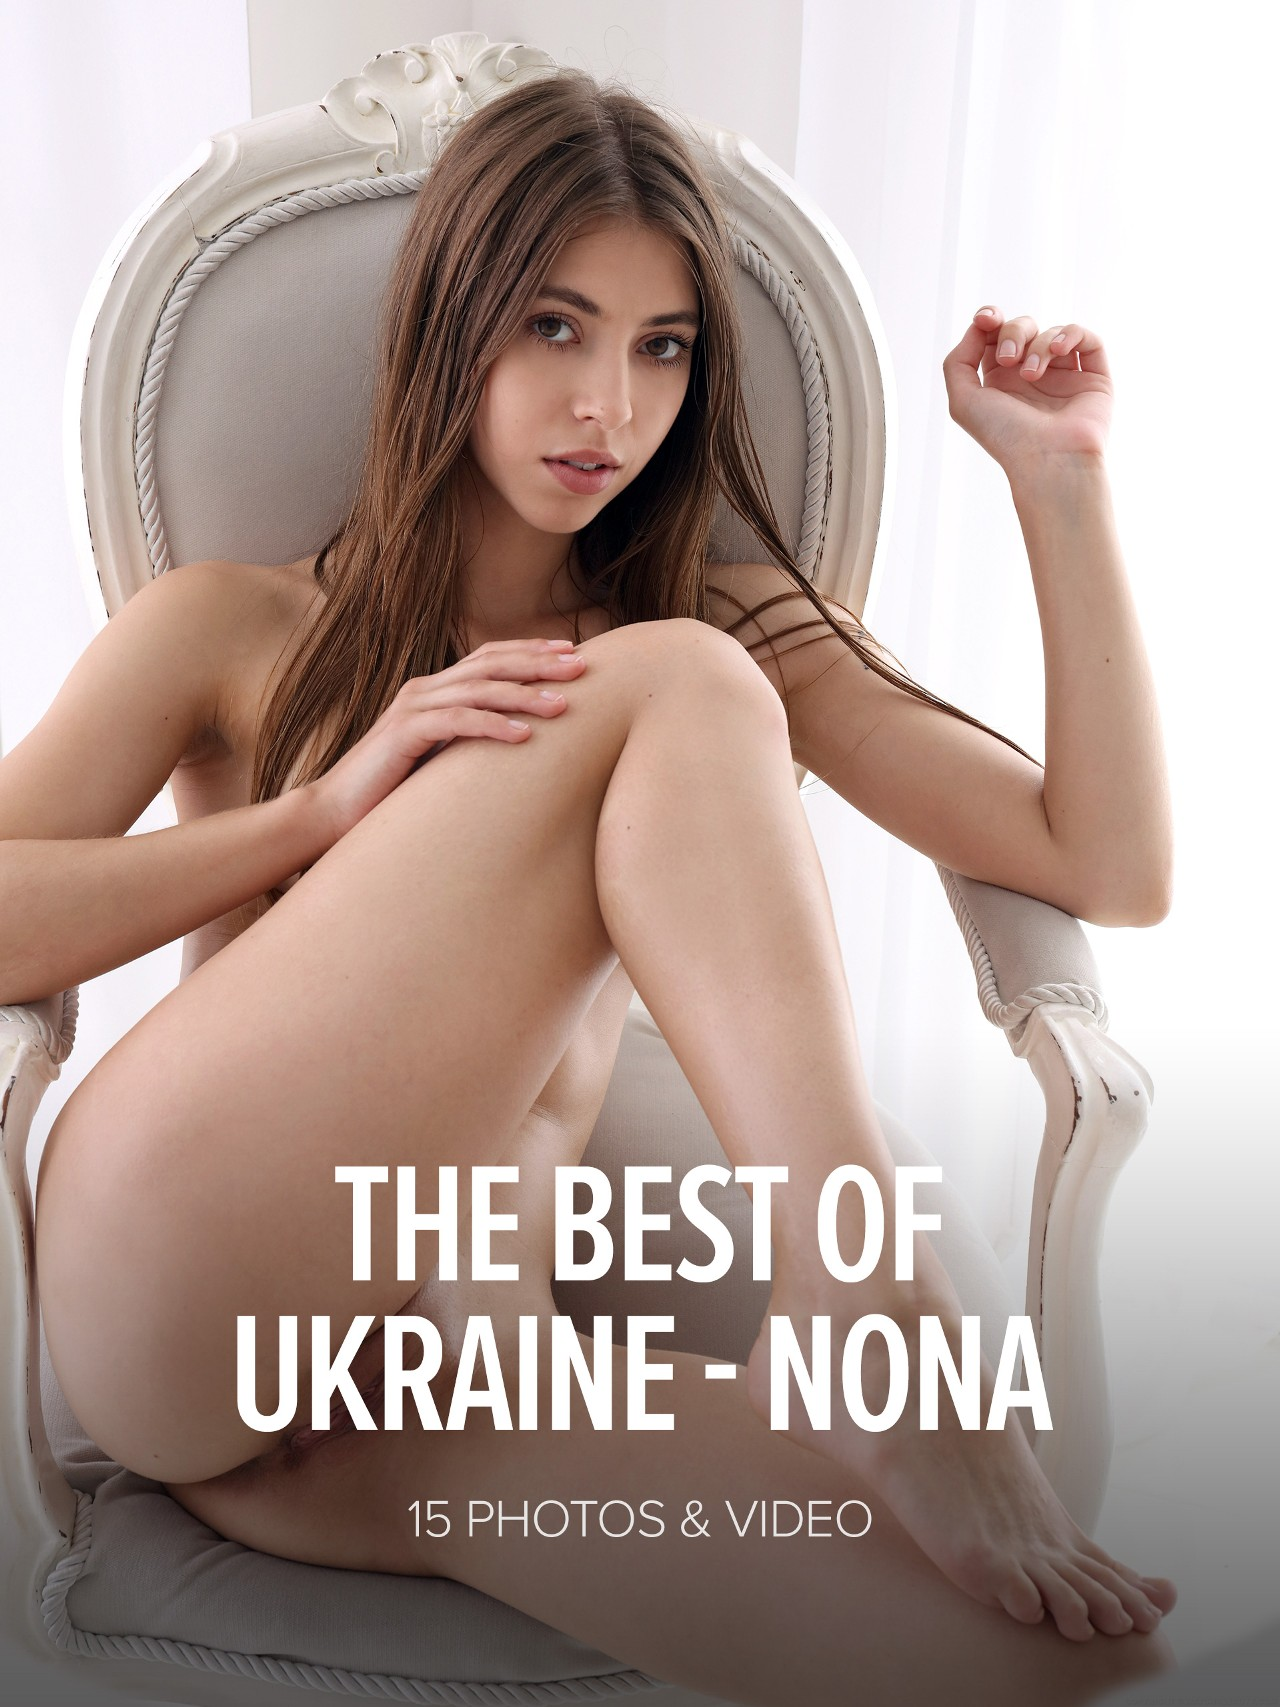 Nona: The Best Of Ukraine - Nona